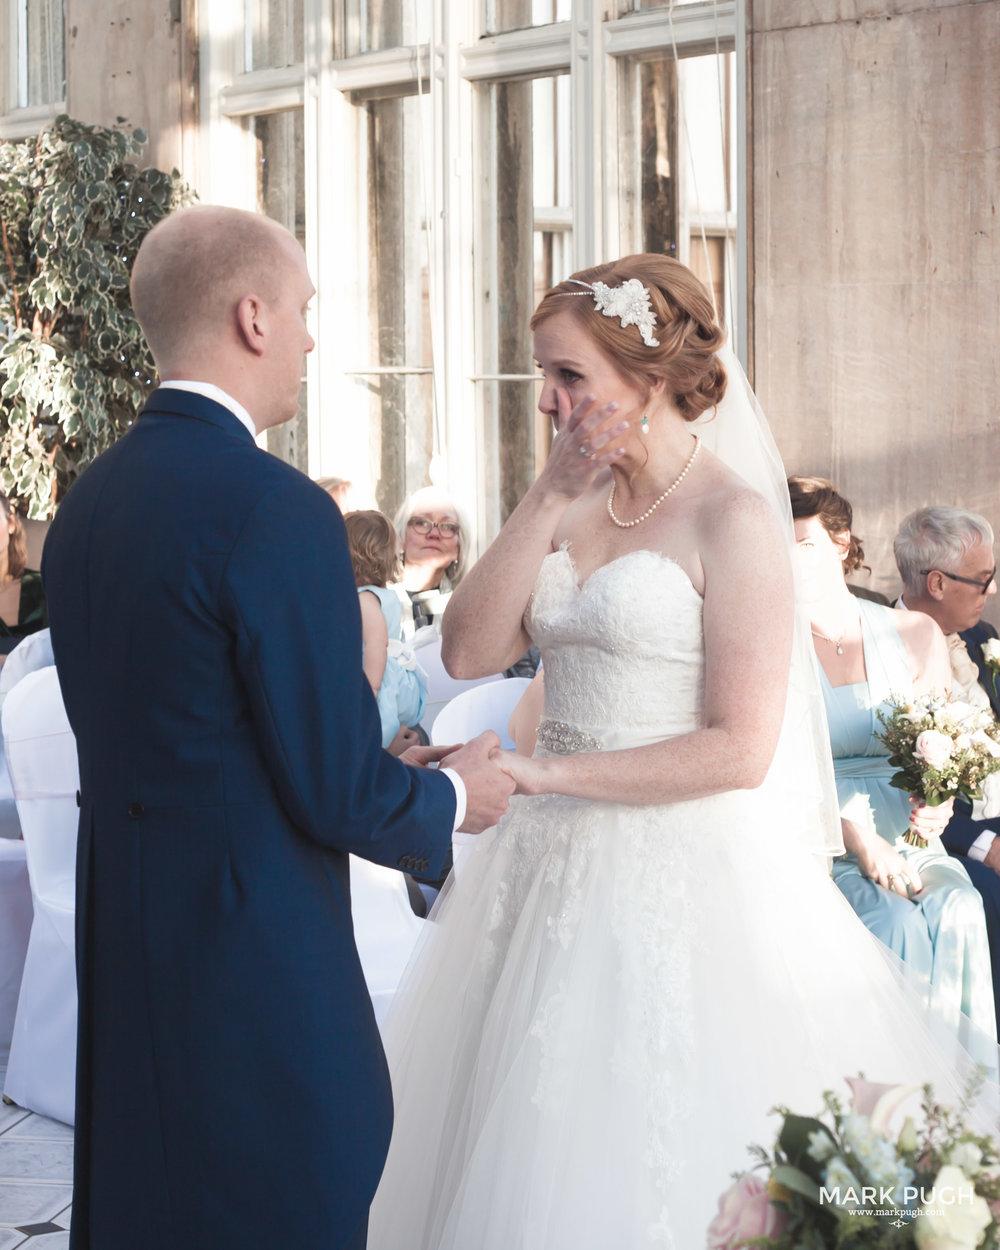 051 - Fay and Craig - fineART Wedding Photography at Stoke Rochford Hall NG33 5EJ by www.markpugh.com Mark Pugh of www.mpmedia.co.uk_.JPG